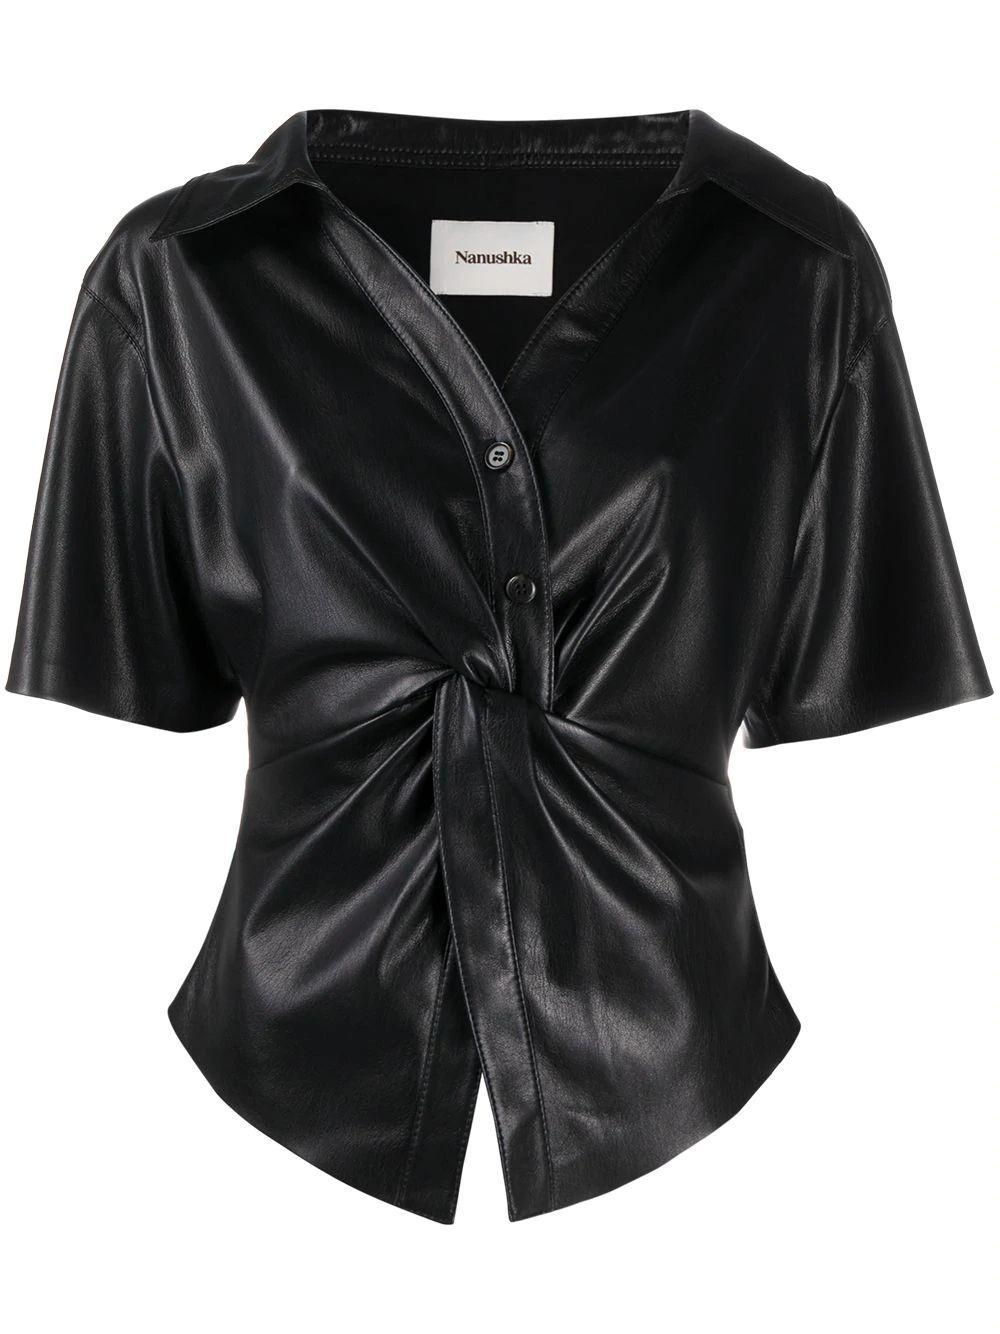 Thora Twist Waist Shirt Item # NW21SSSH00899